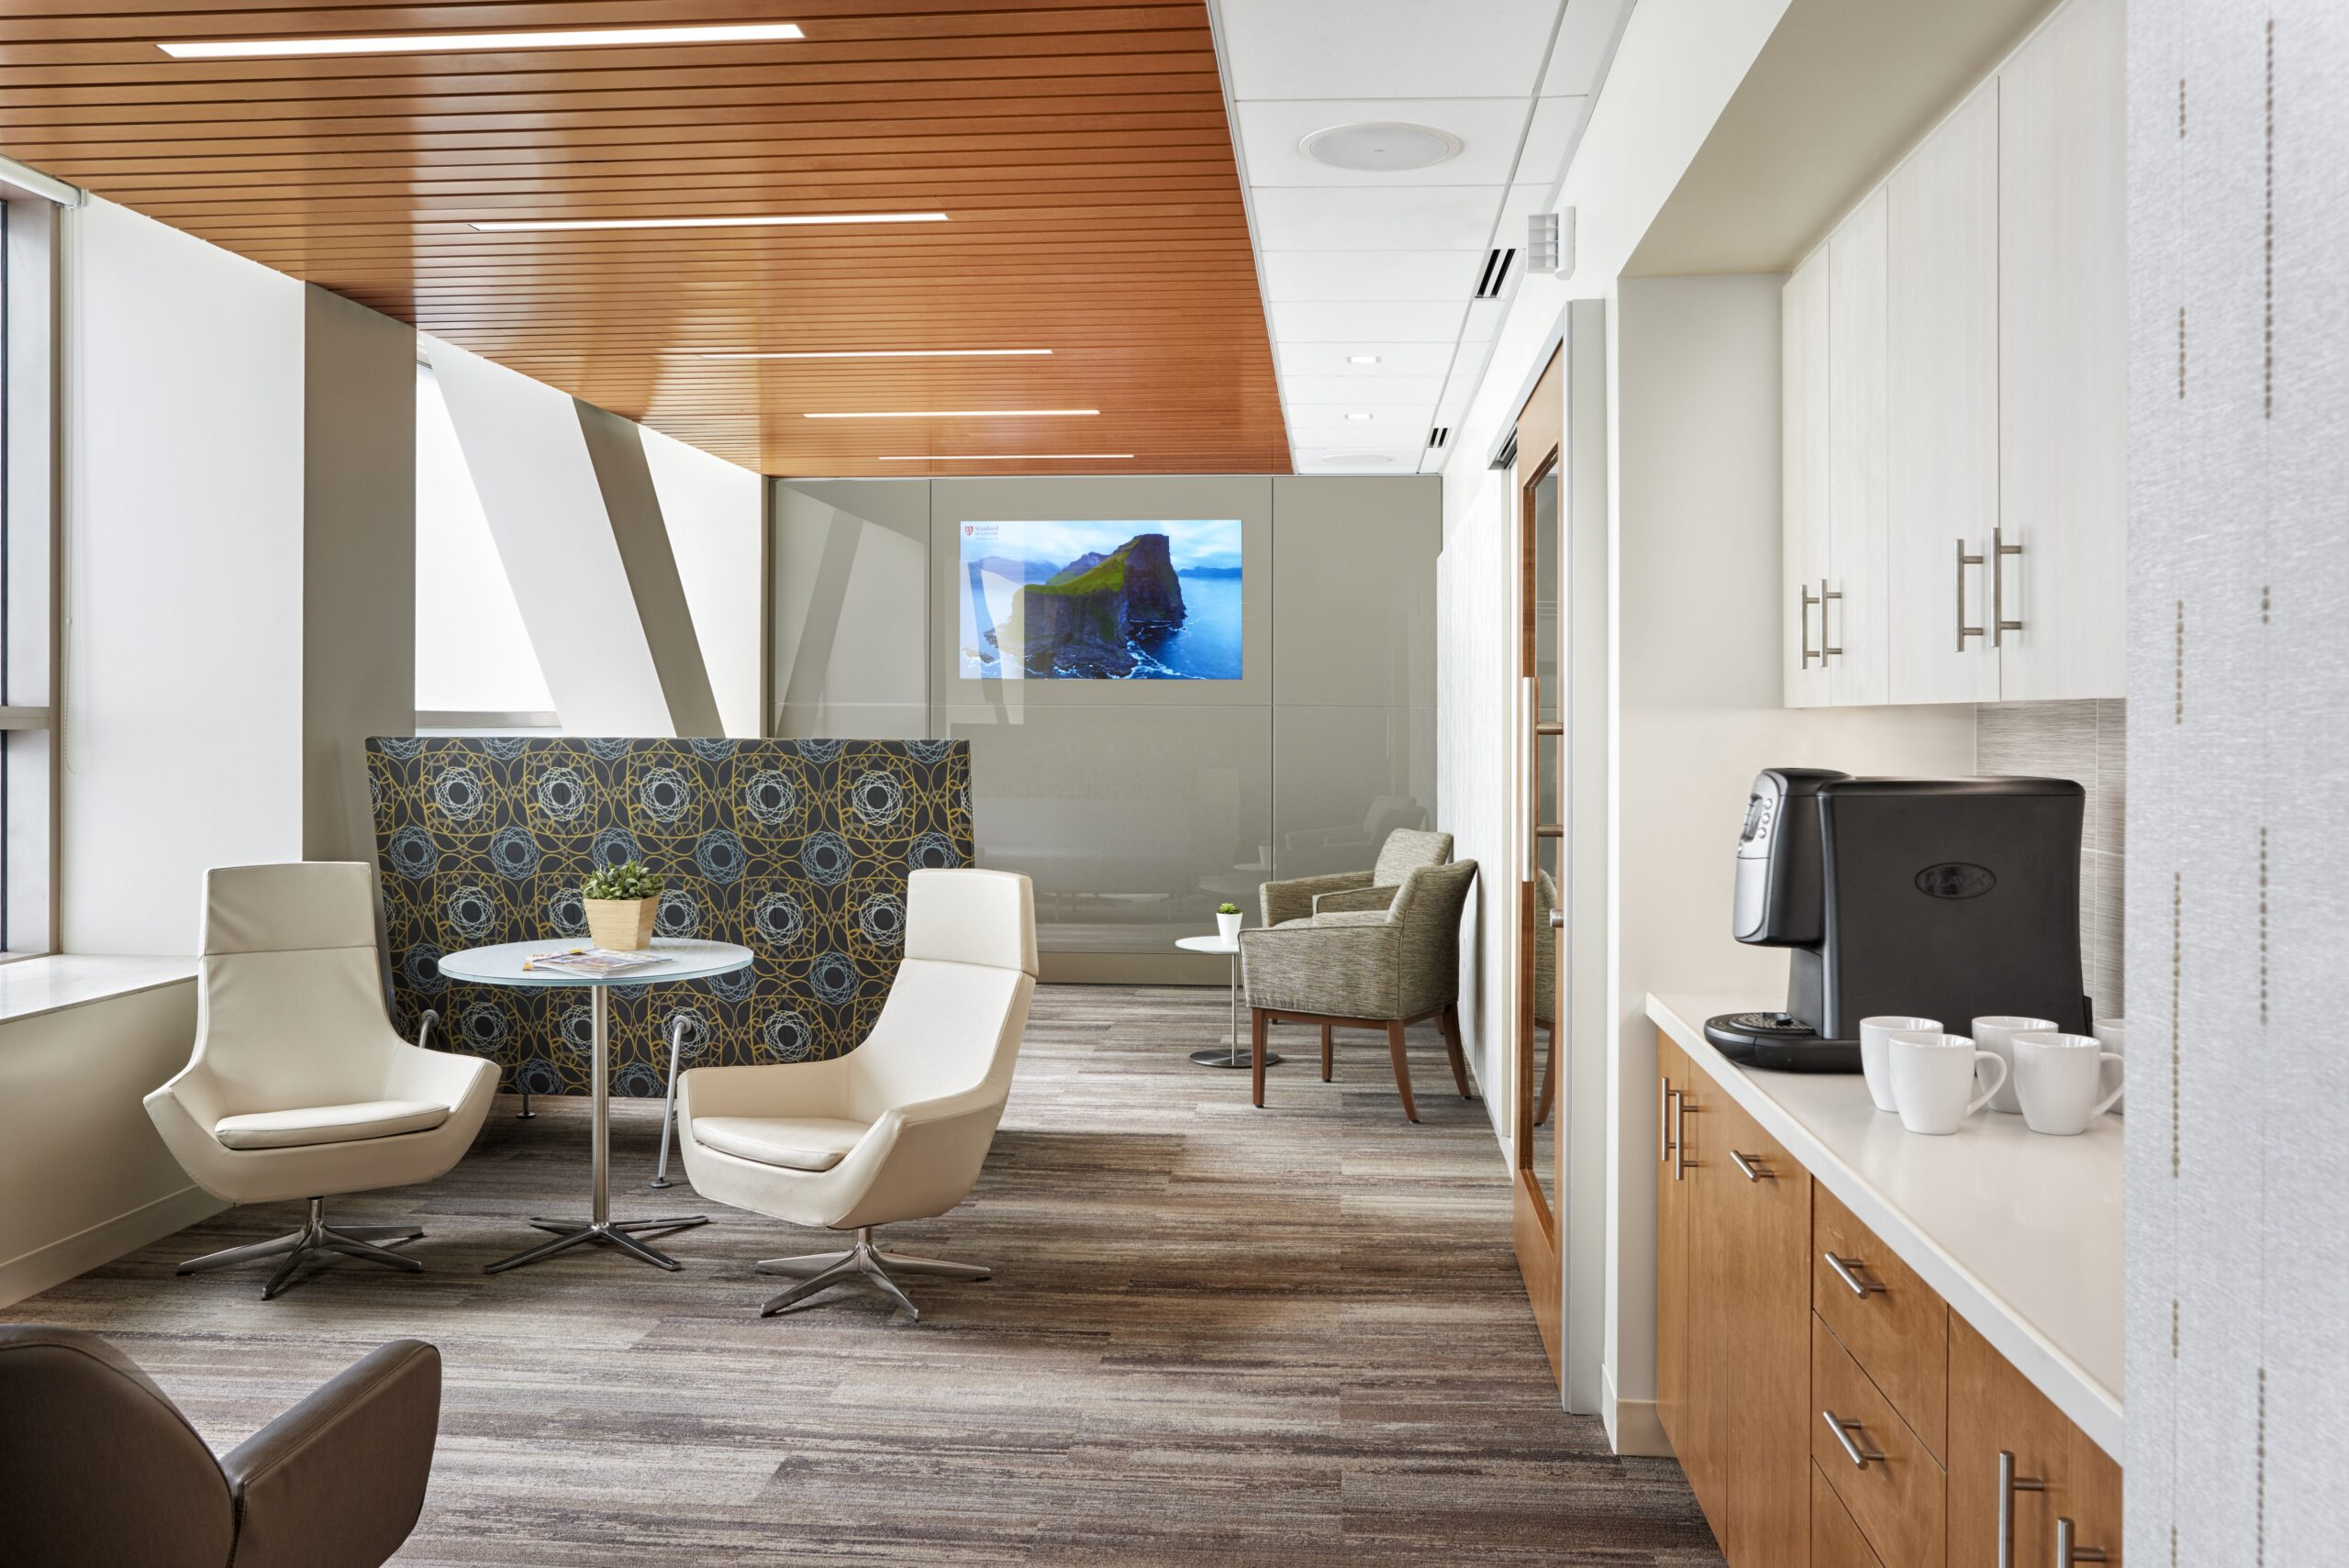 Stanford Health Care Comprehensive Cancer Center Breast Imaging Department Remodel